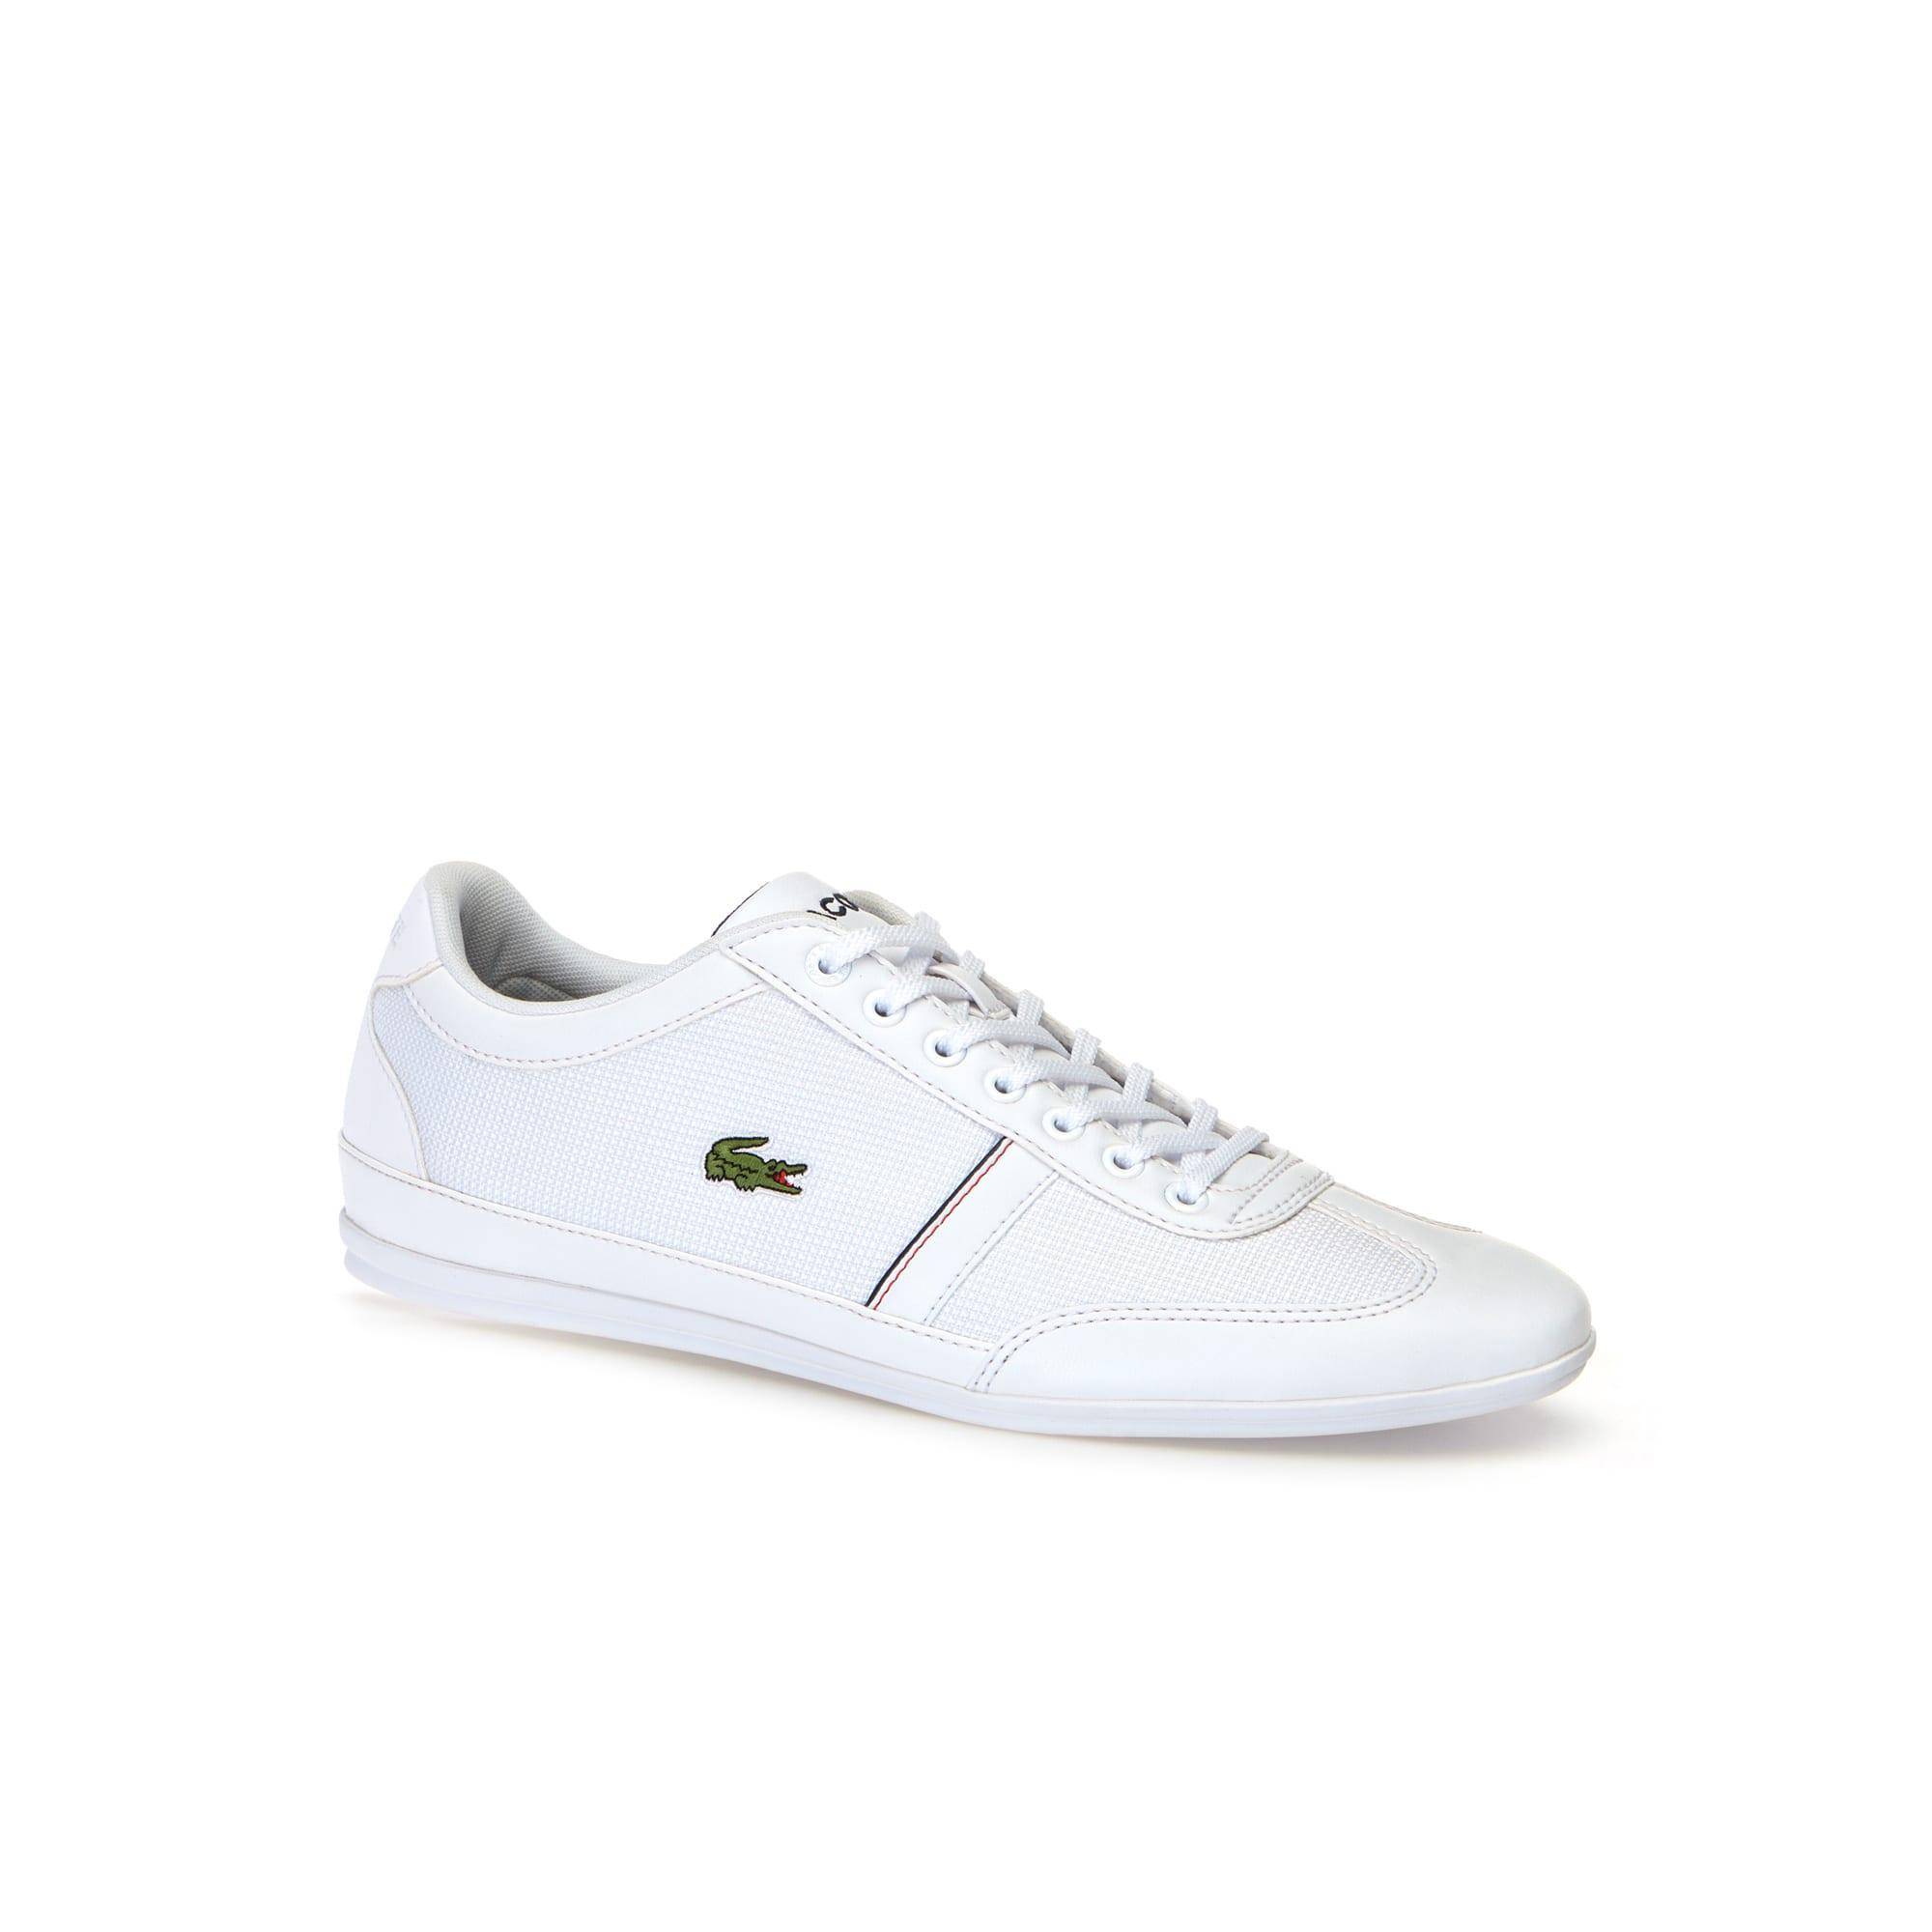 Herren-Sneakers MISANO aus Textil und Synthetik LACOSTE SPORT